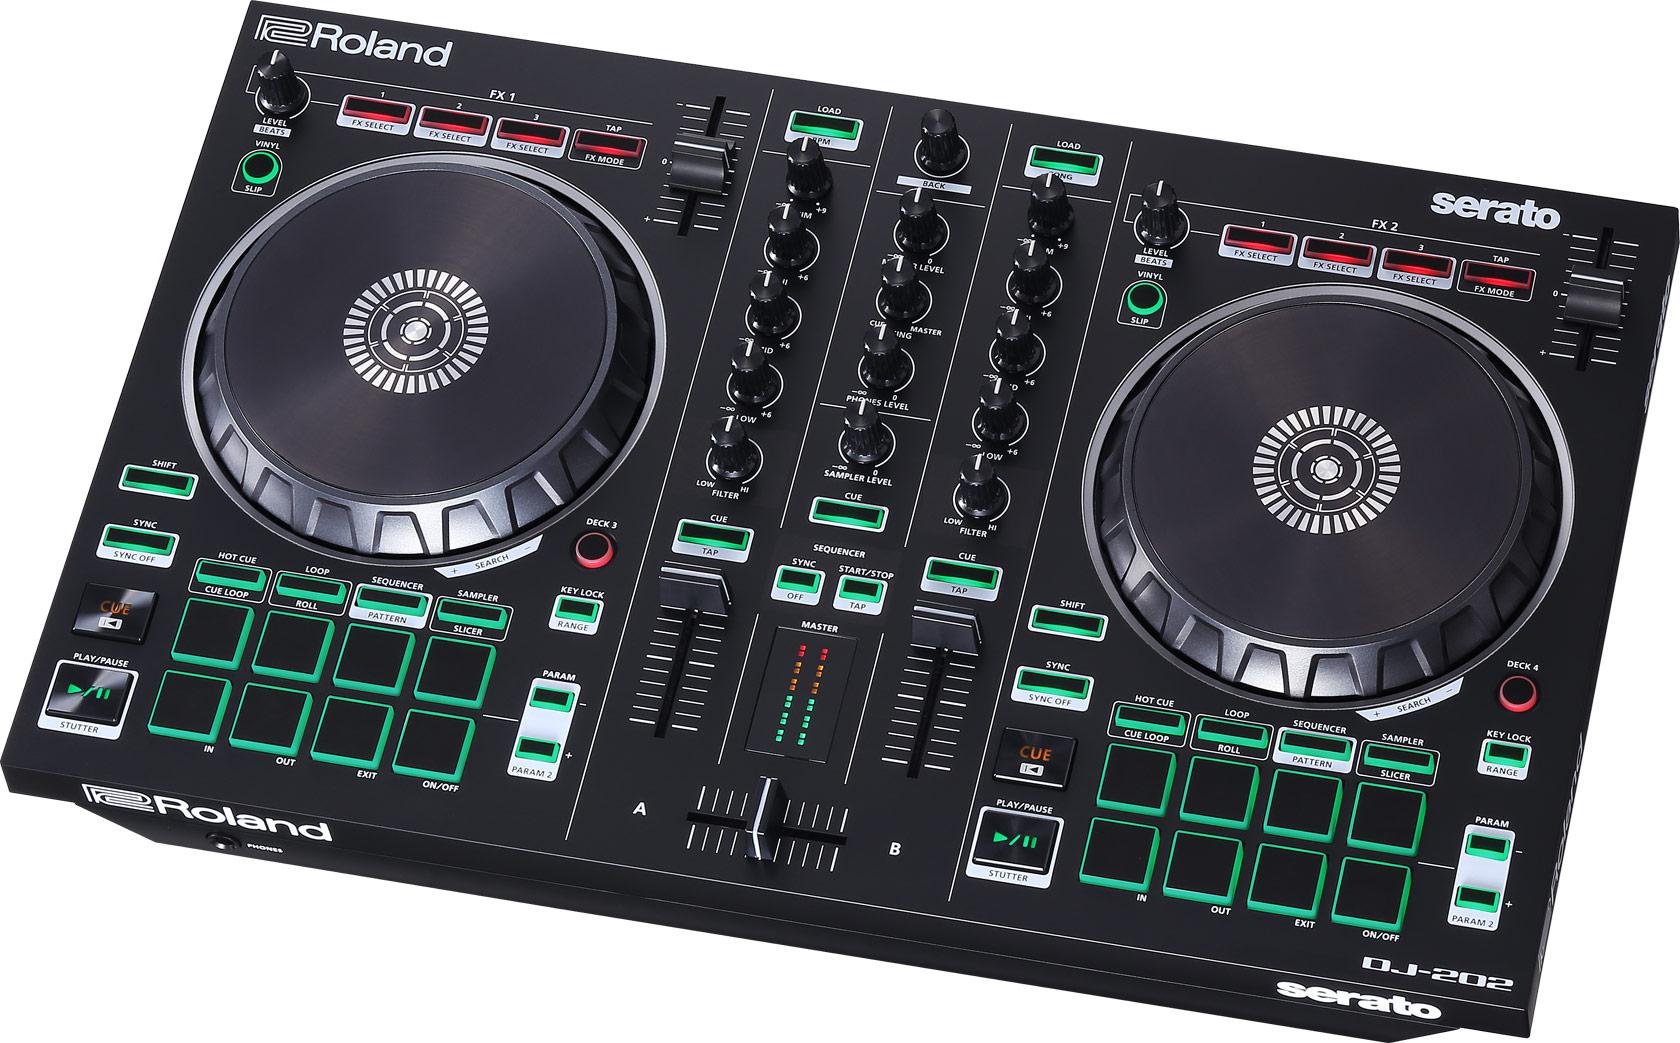 Roland DJ-202 - - £219 - Serato DJ Intro